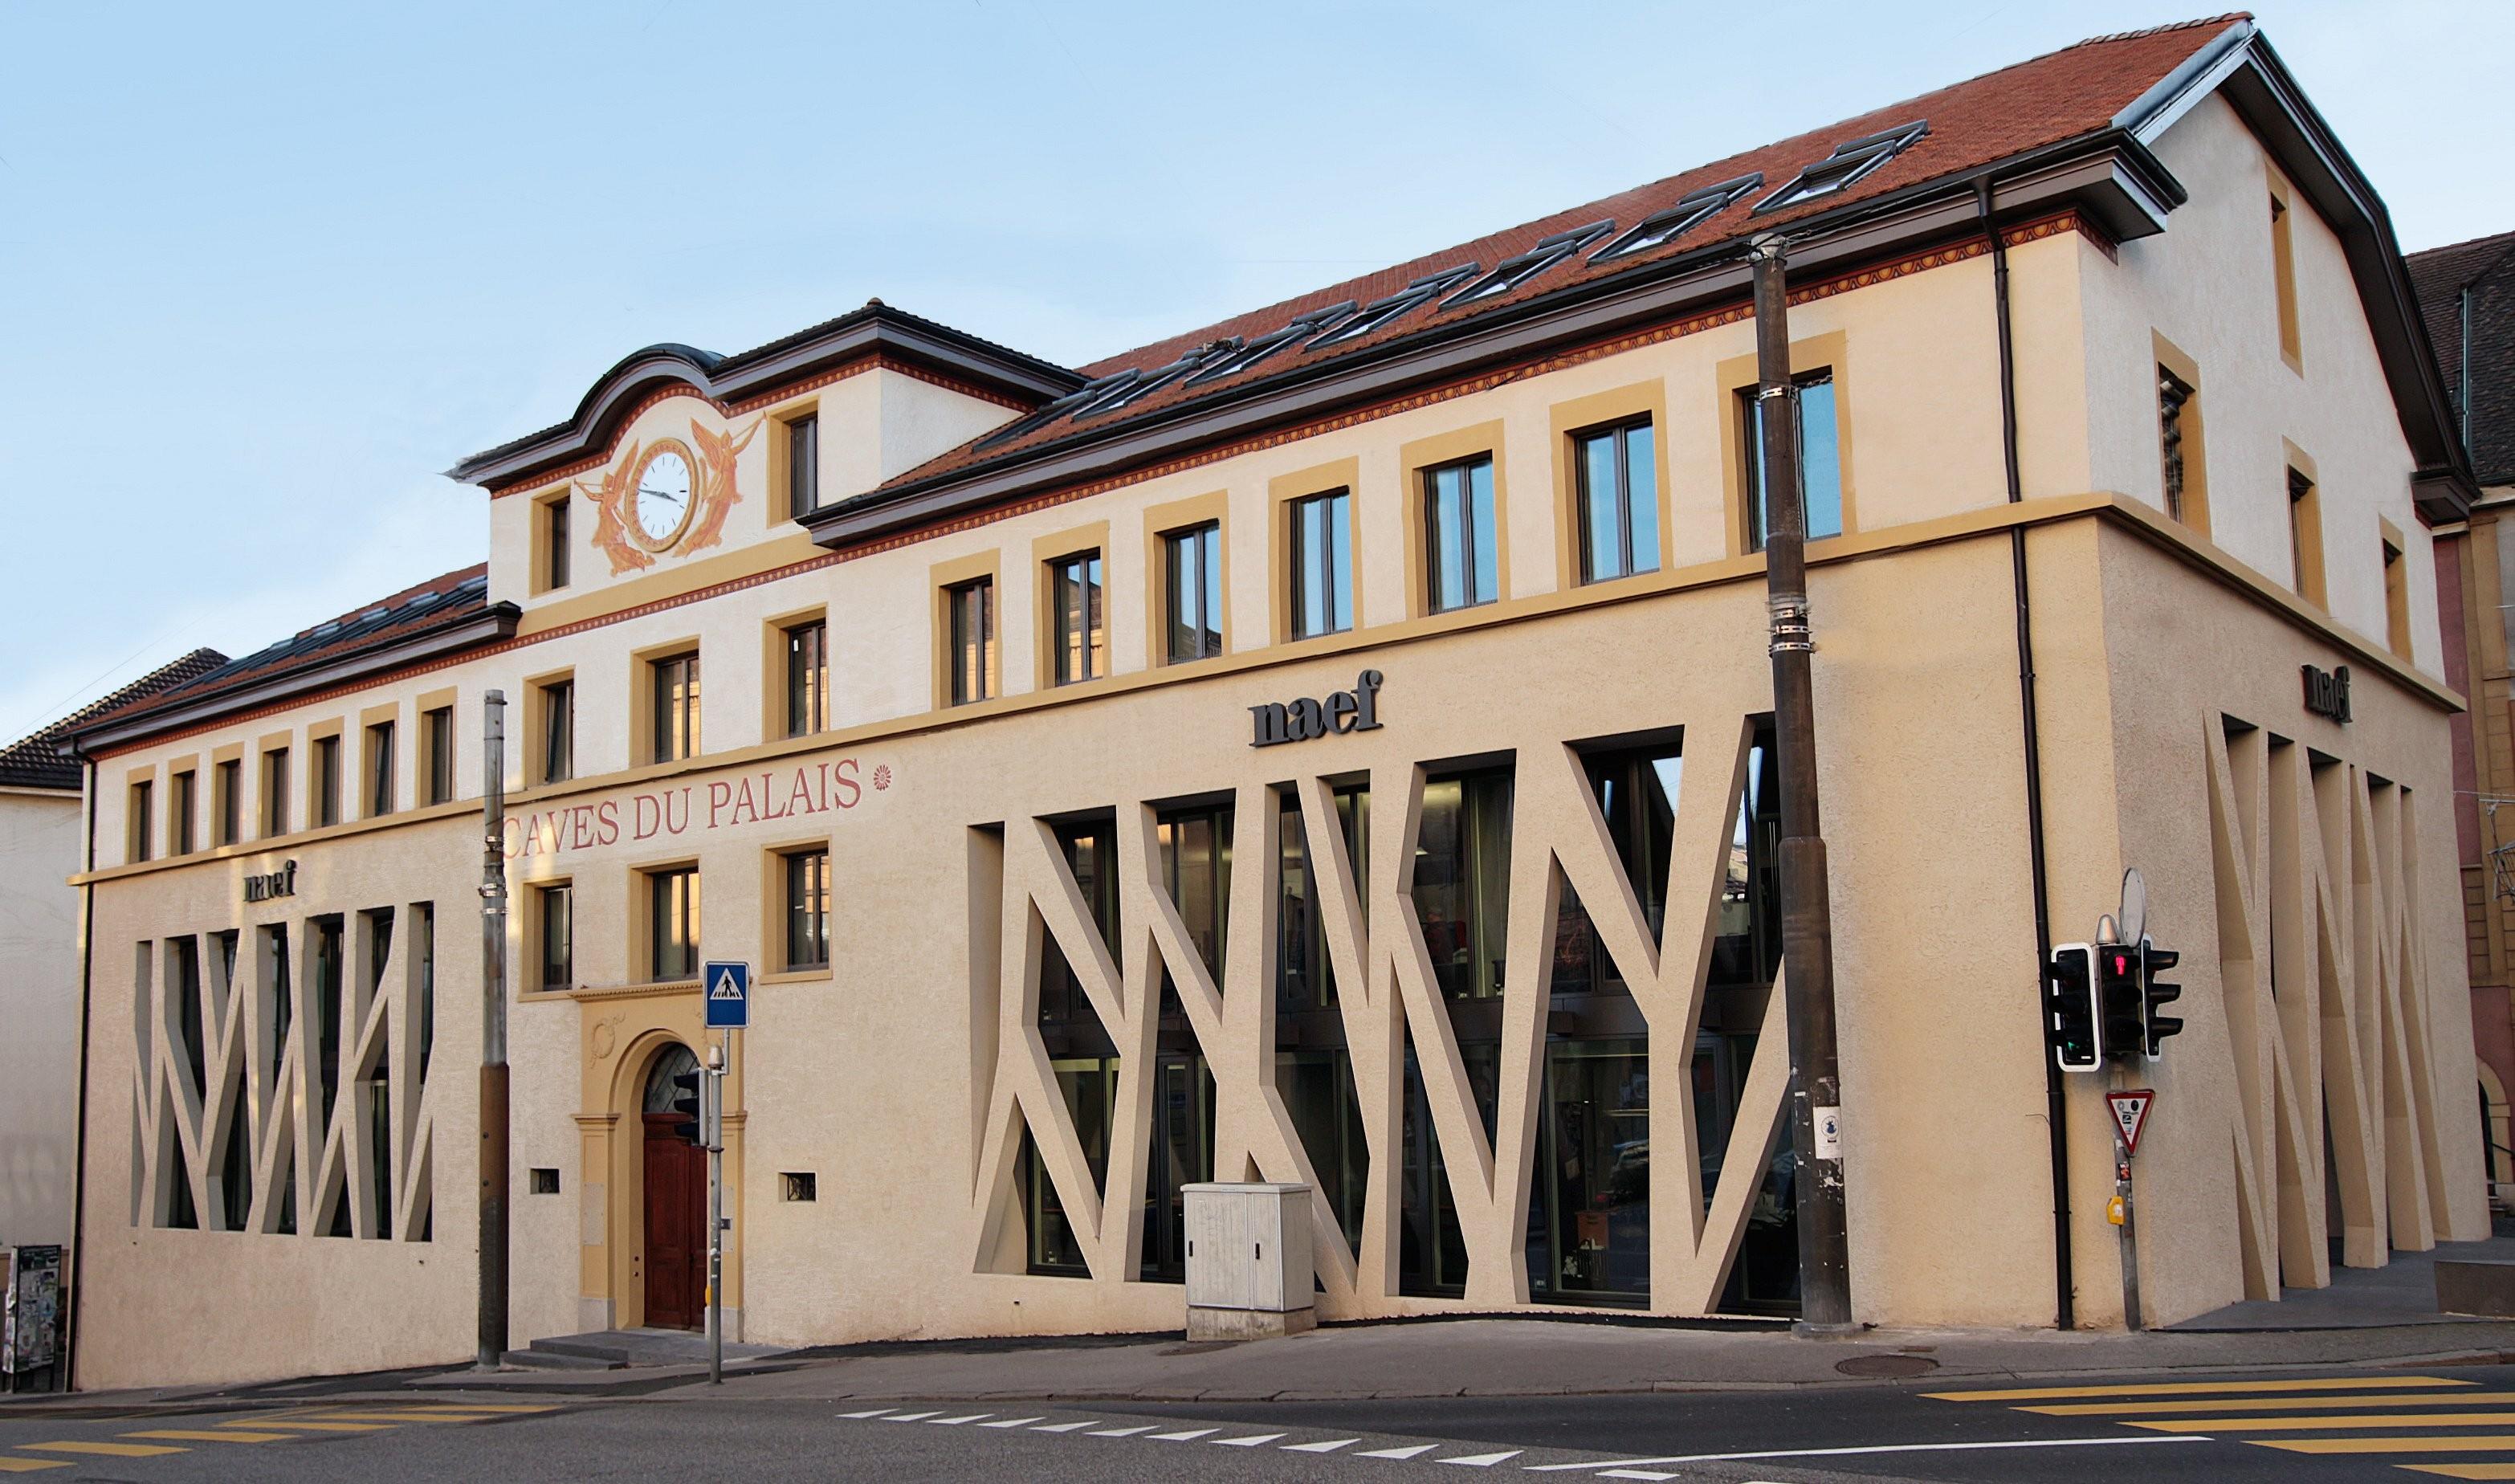 Immobilier Suisse romande 2